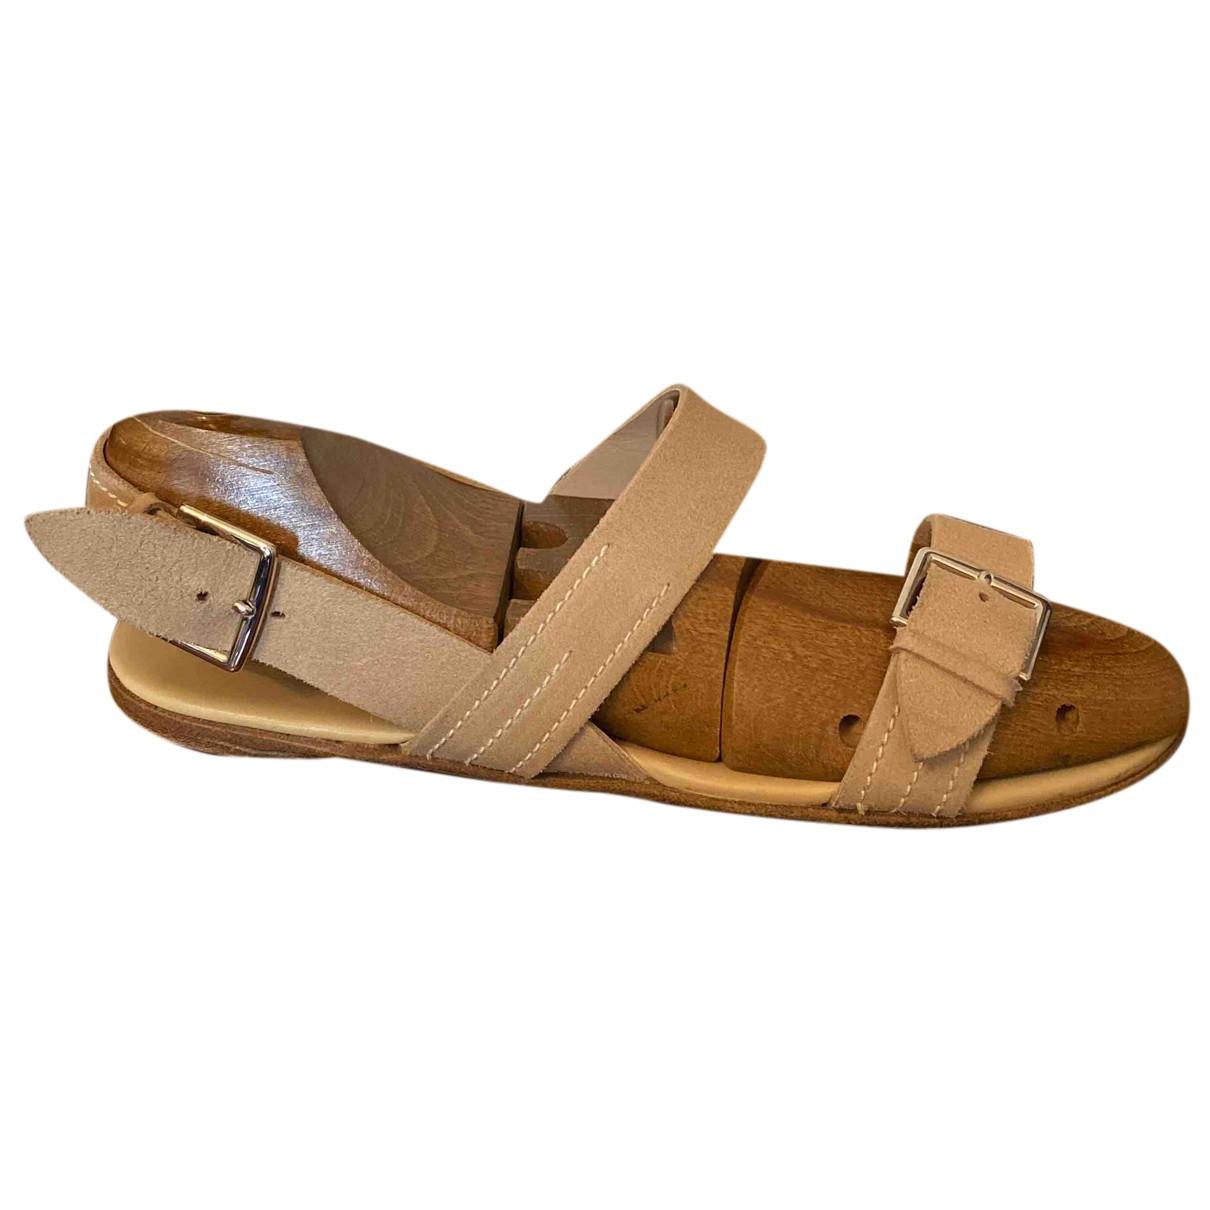 Hermes - Sandales   pour homme en suede - beige